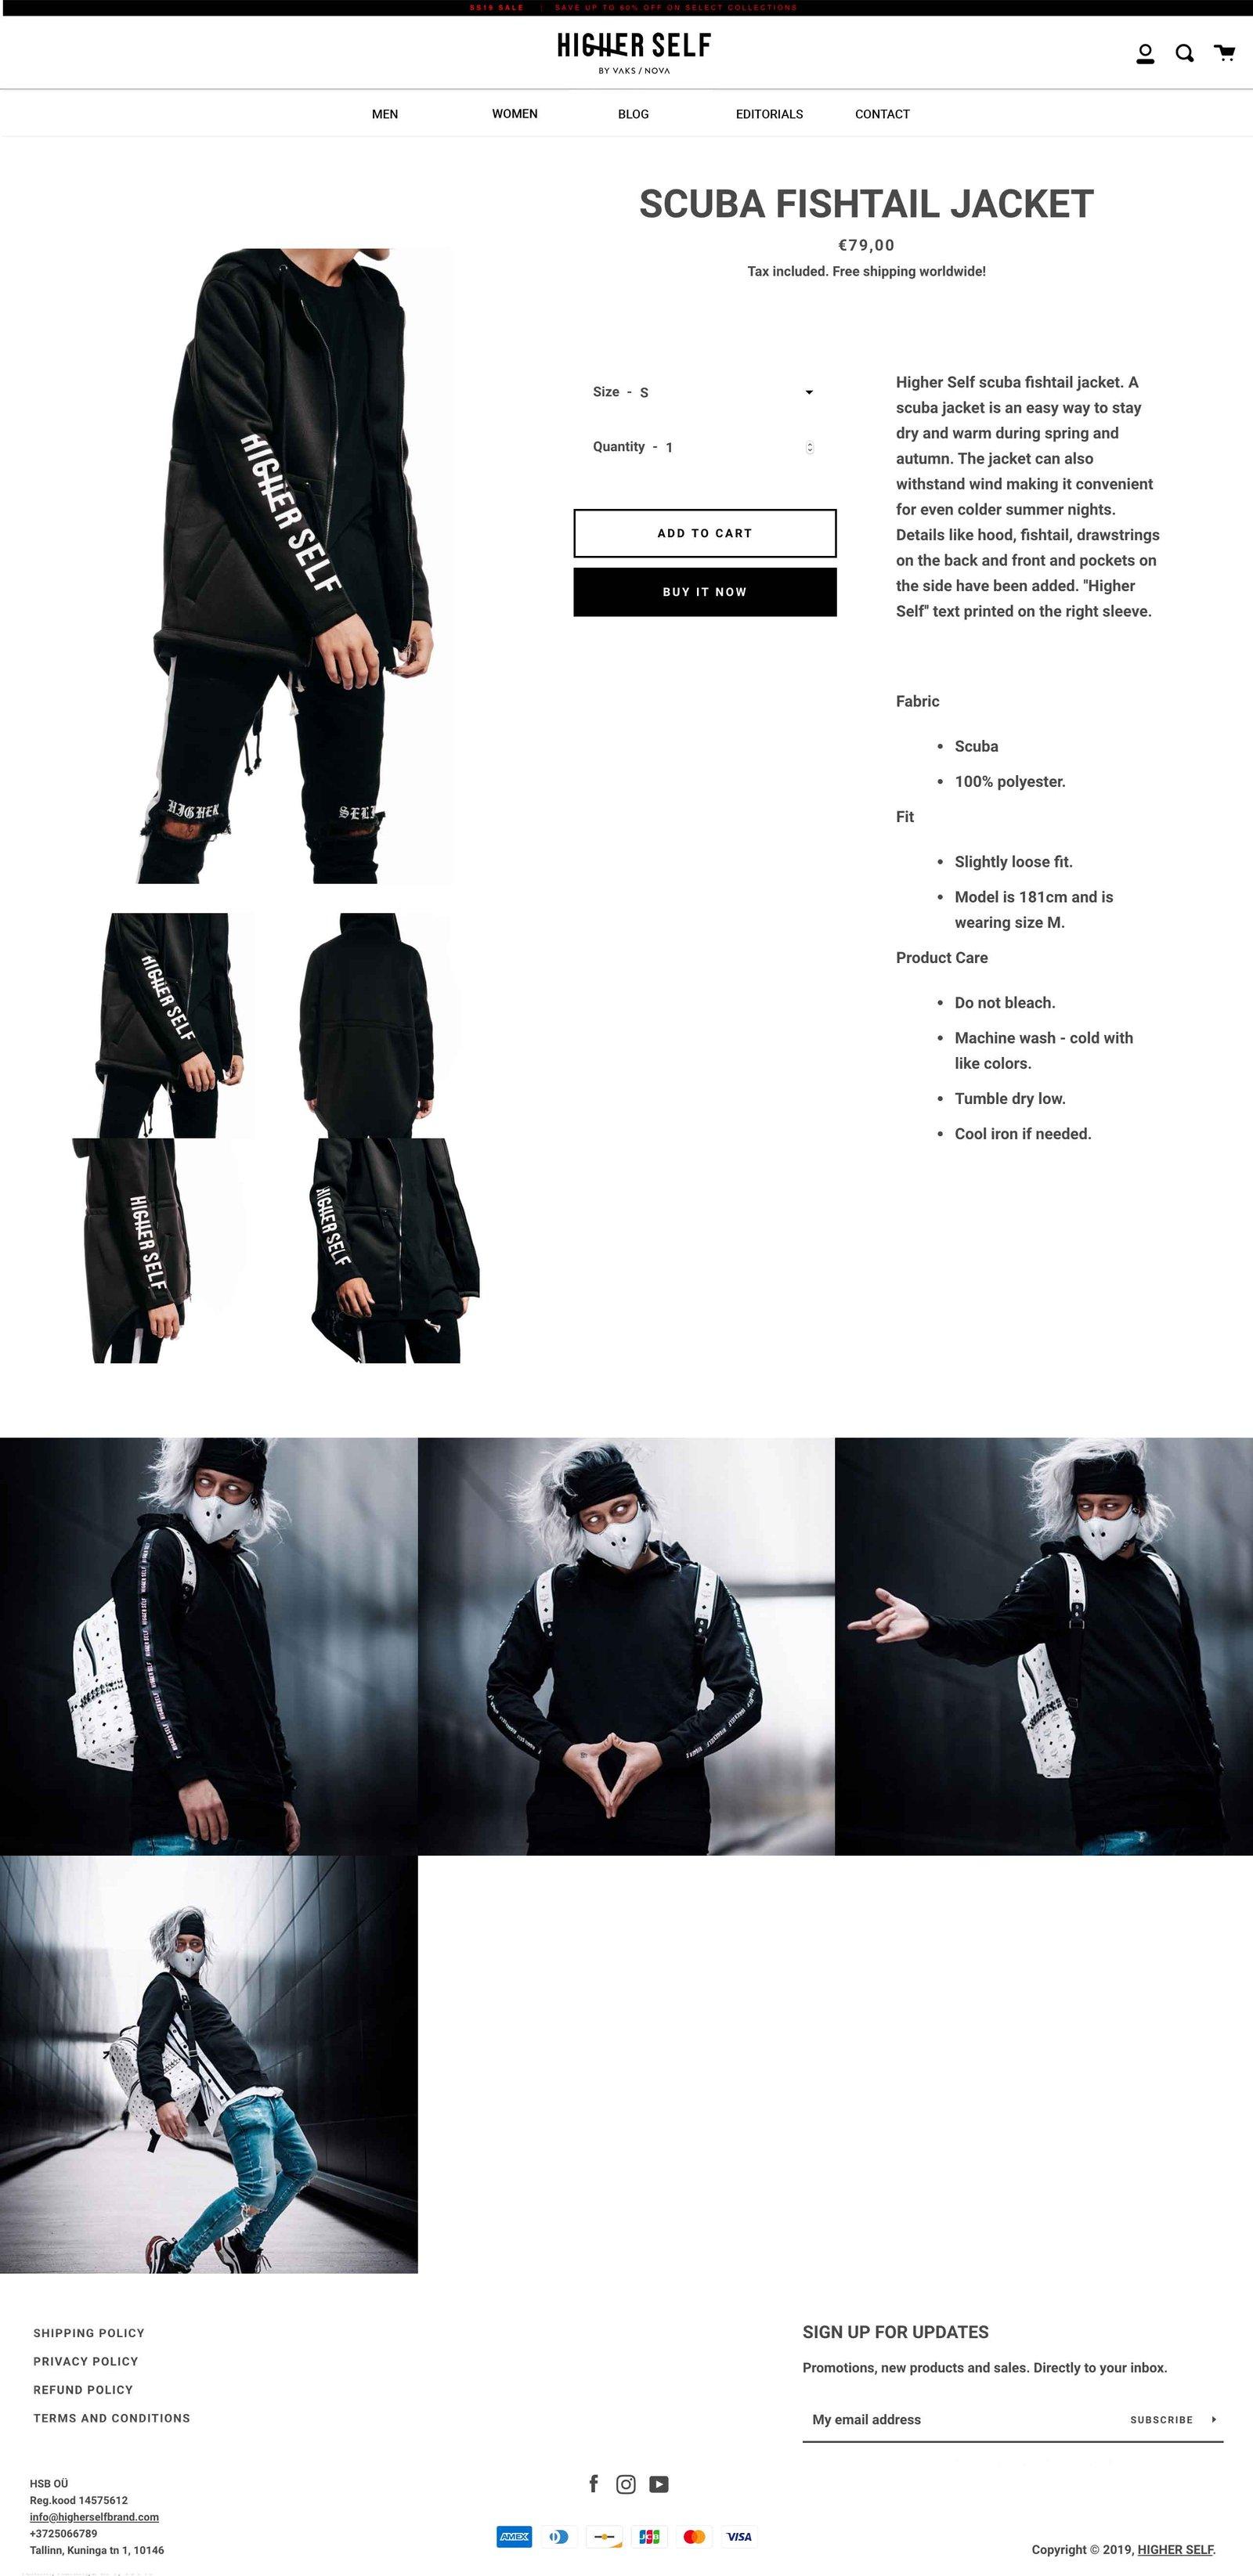 screencapture-higherselfbrand-products-scuba-fishtail-jacket-2019-09-12-16_38_02